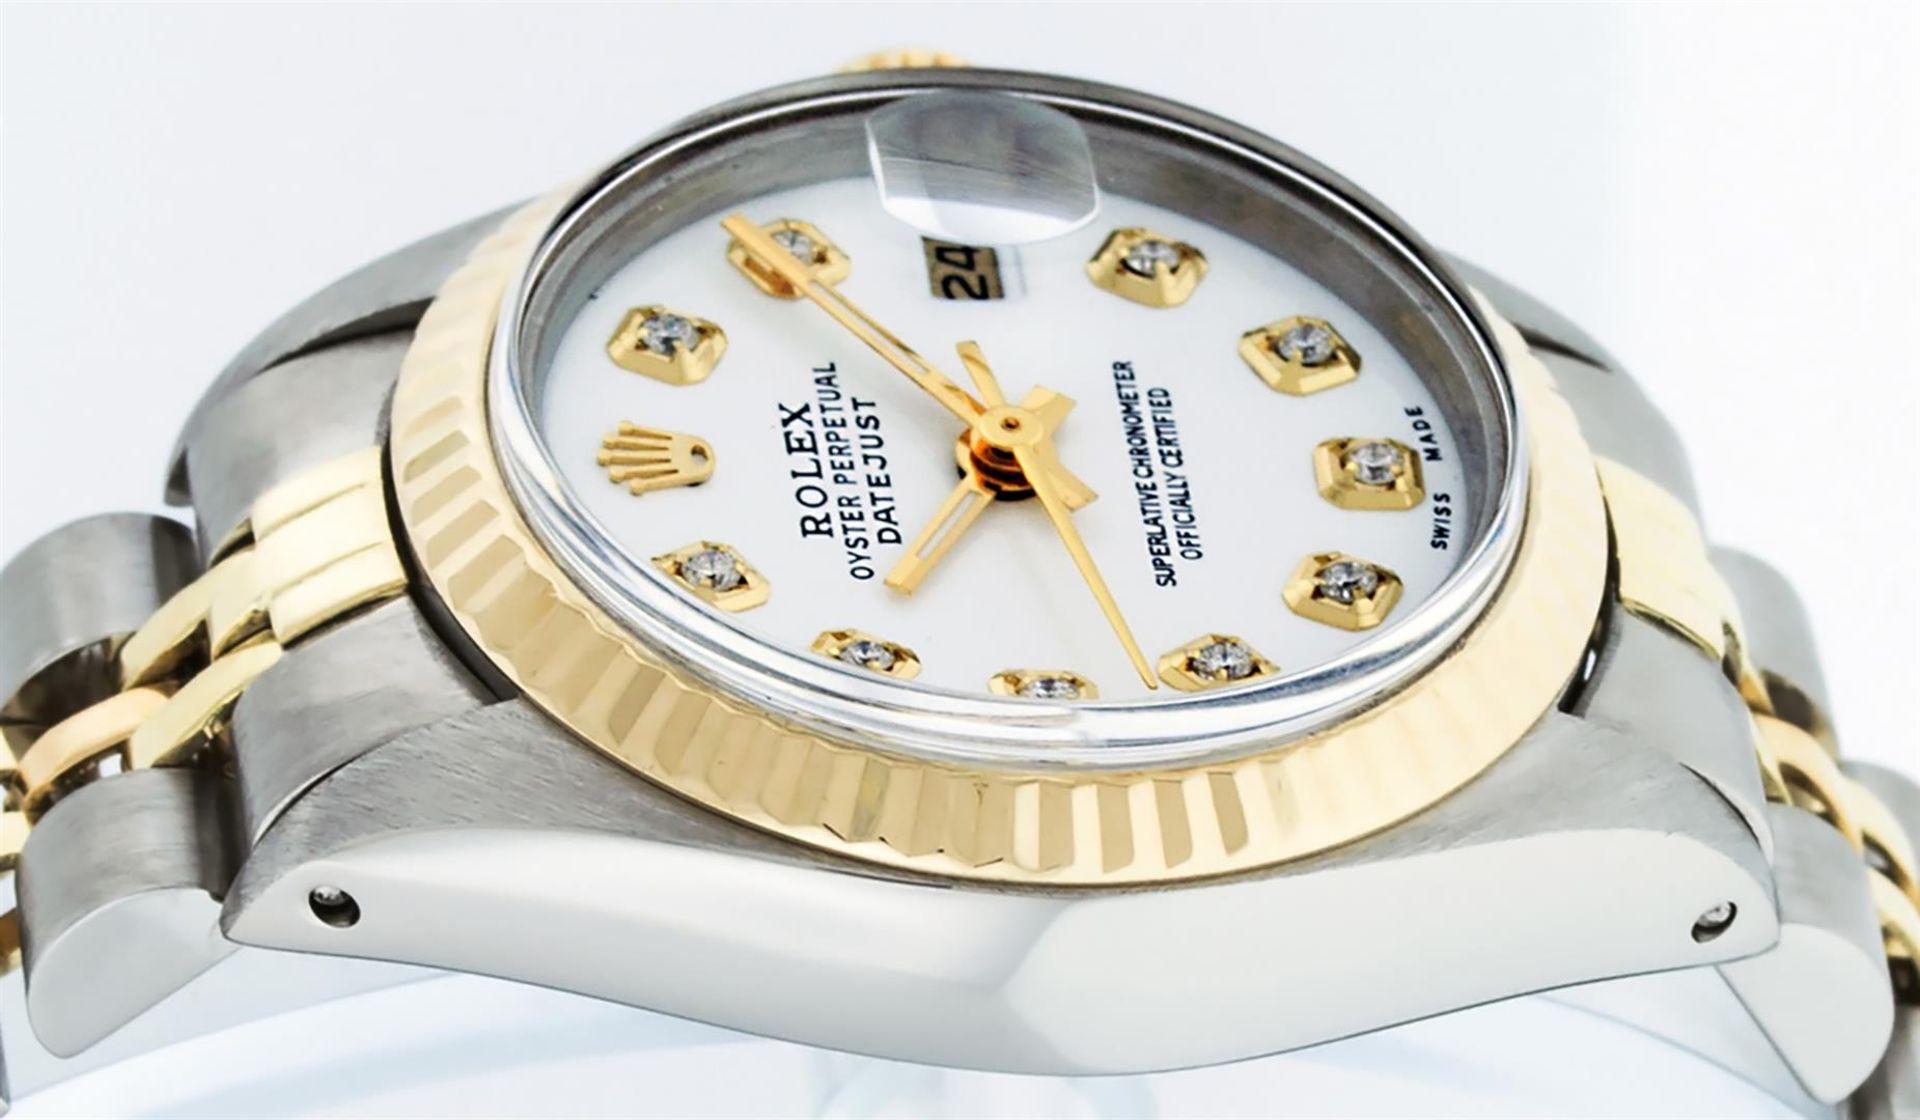 Rolex Ladies 2 Tone White Diamond 26MM Datejust Wristwatch - Image 5 of 8